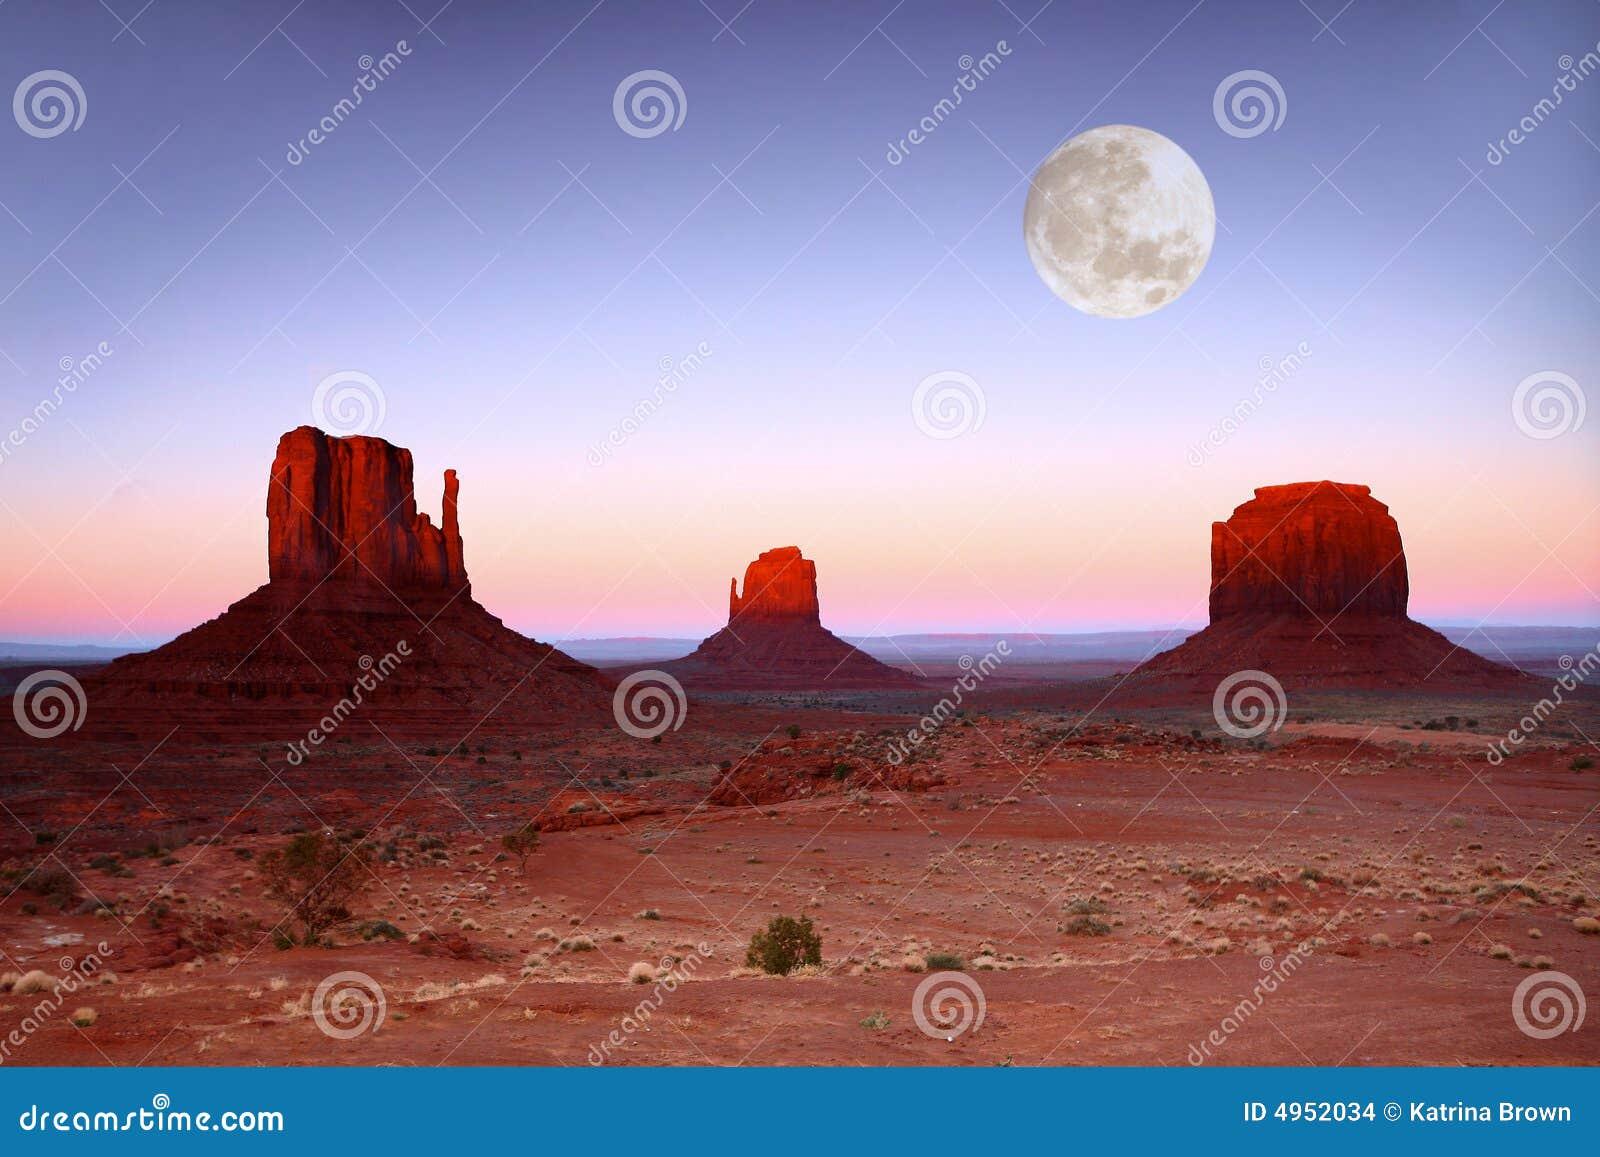 Sundown on the Buttes in Monument Valley Arizona